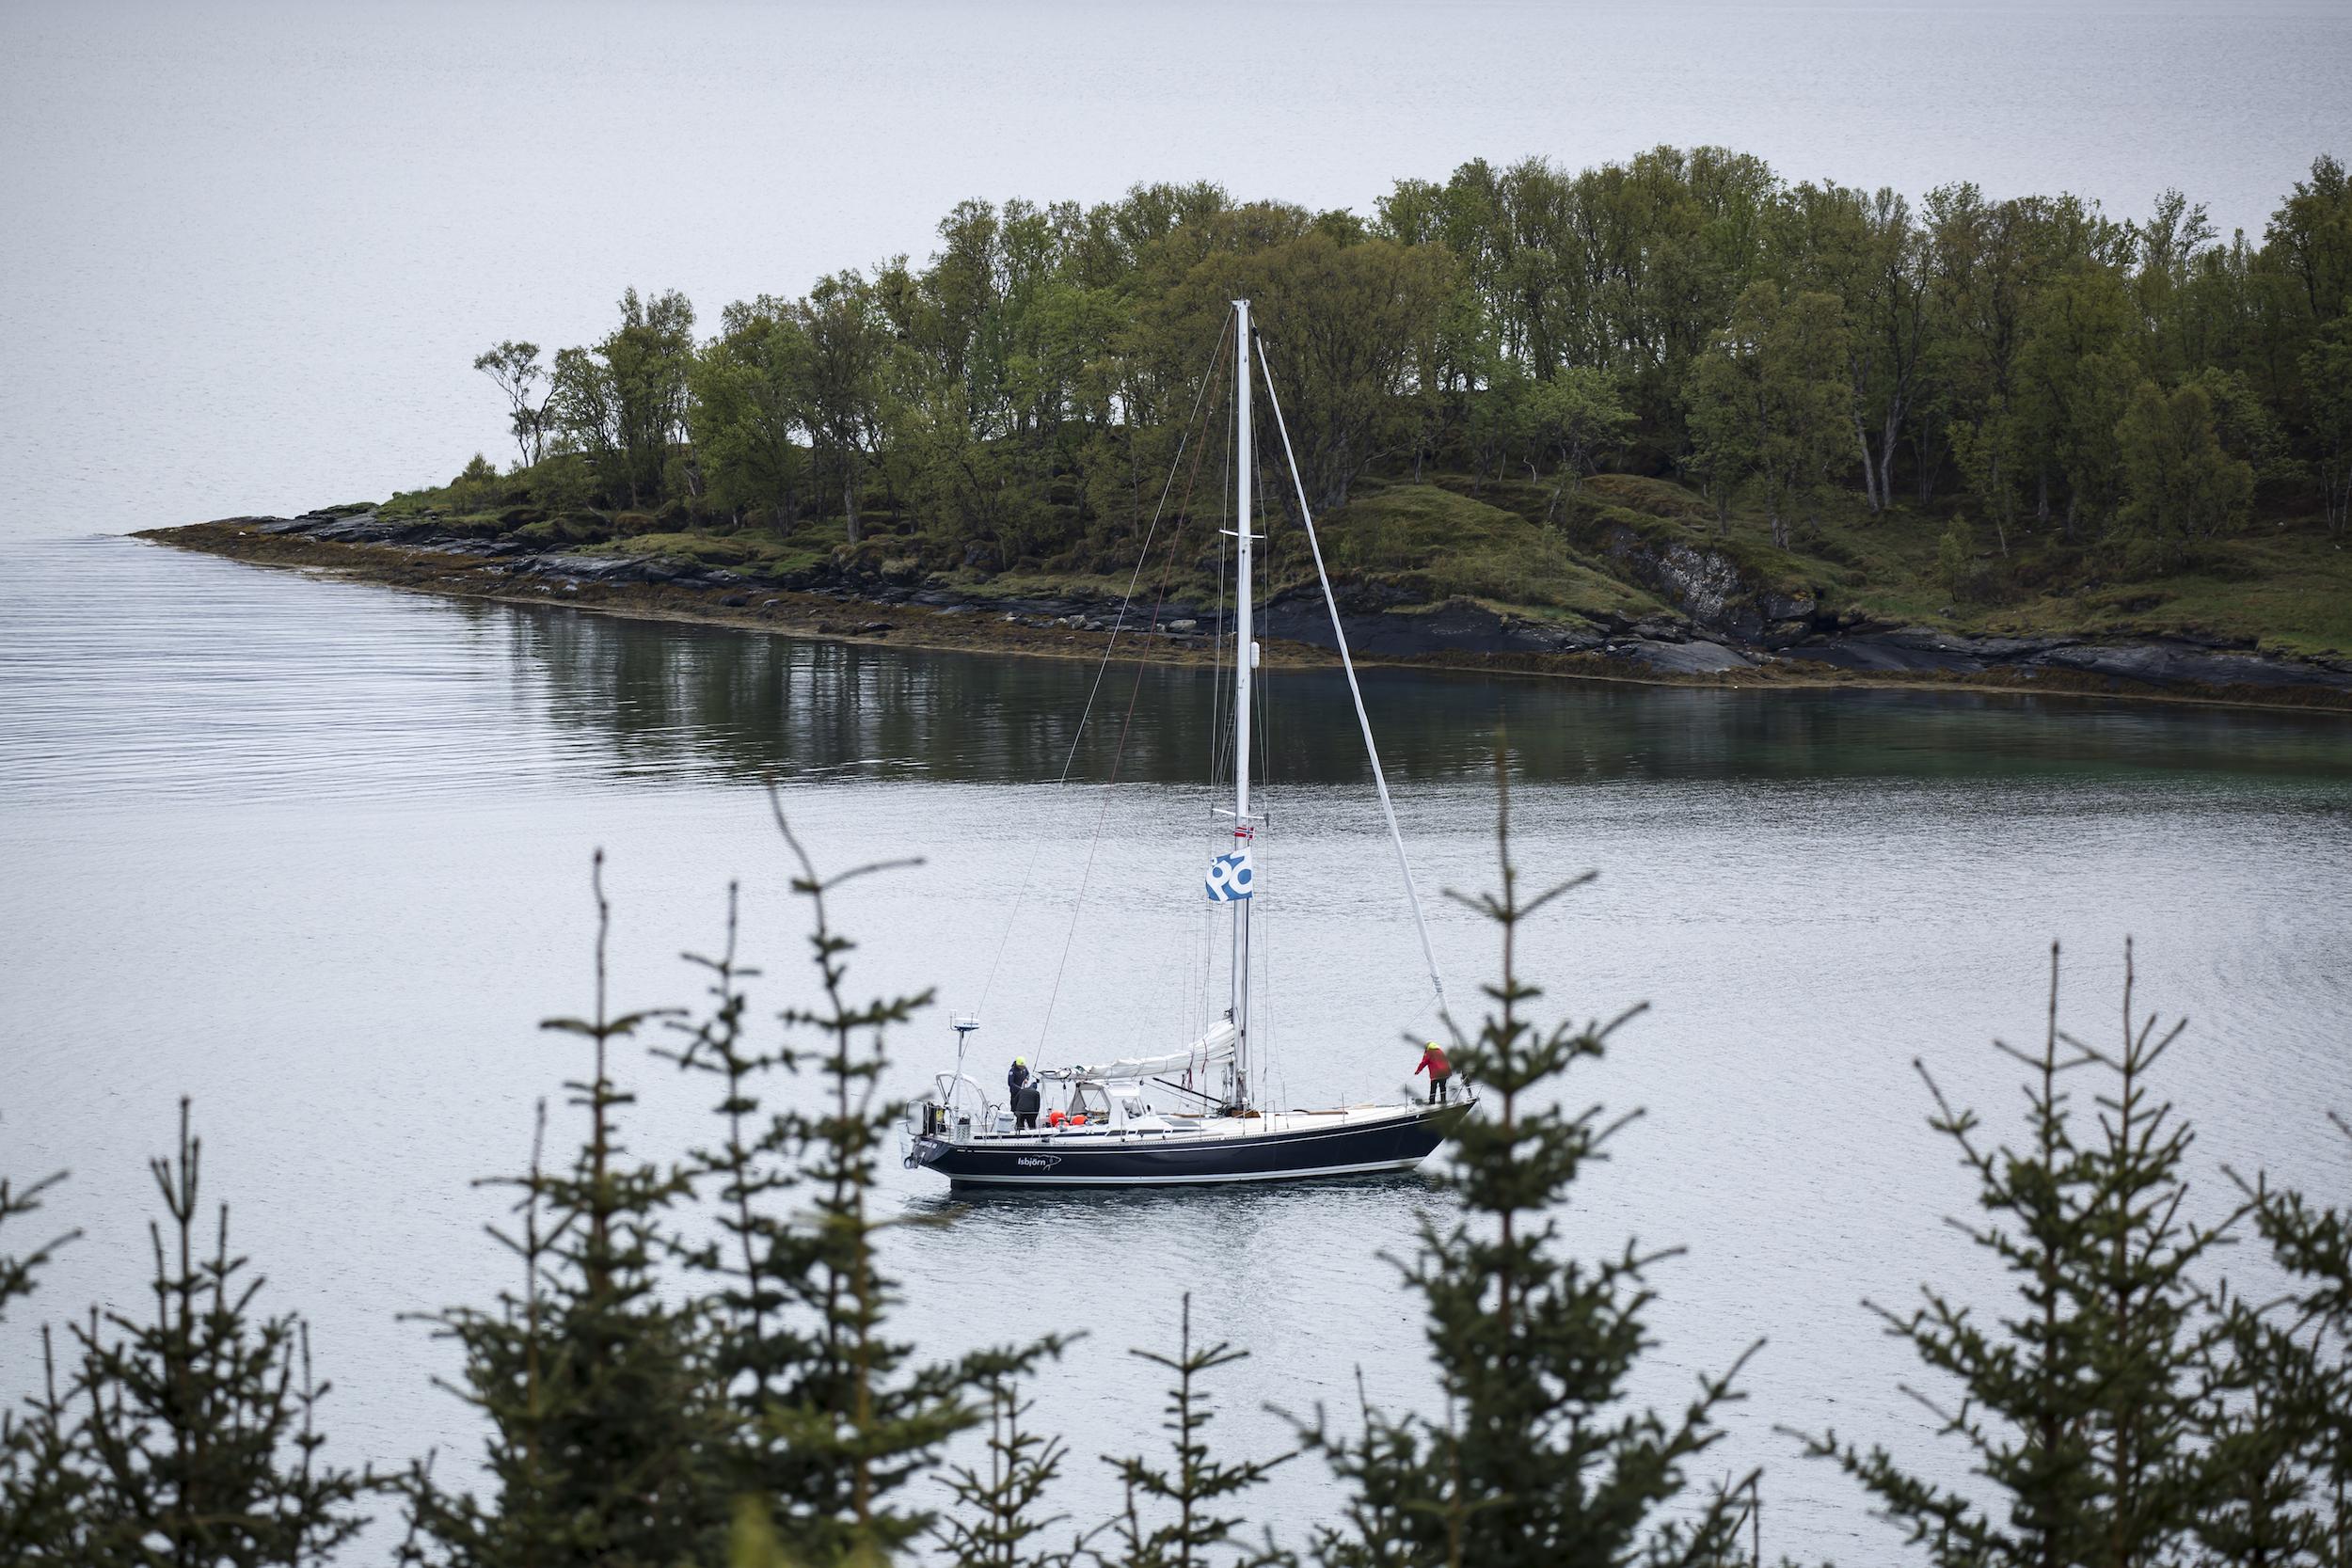 Isbjorn snug at anchor in Finnkroken, preparing for departure.